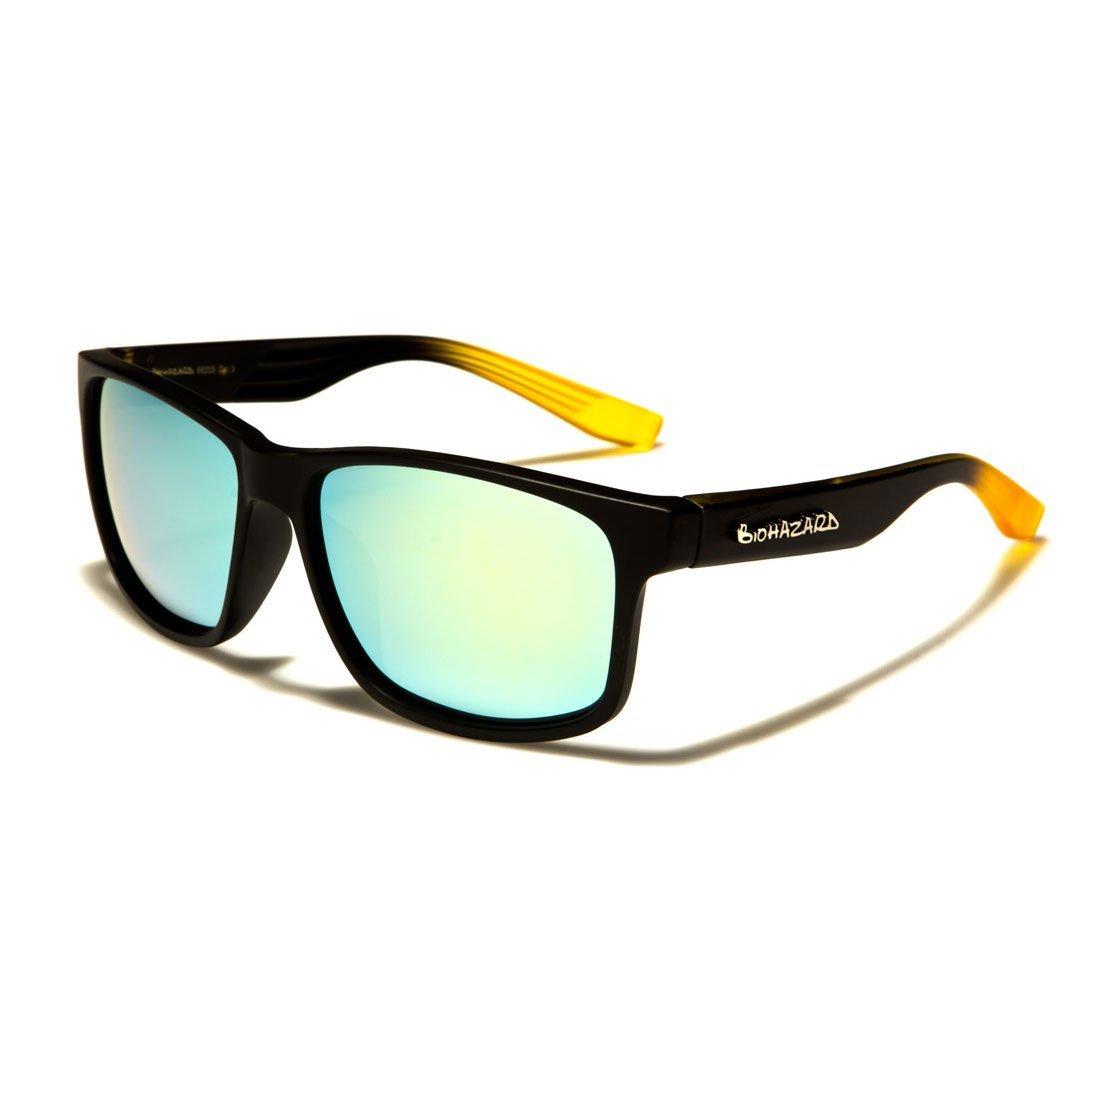 b3dac158d17 Biohazard Wayfarer Sunglasses Fashion Unisex Men s Women s Nerd Glasses  Aviator 30 Colors - Model 1 1  Amazon.co.uk  Clothing